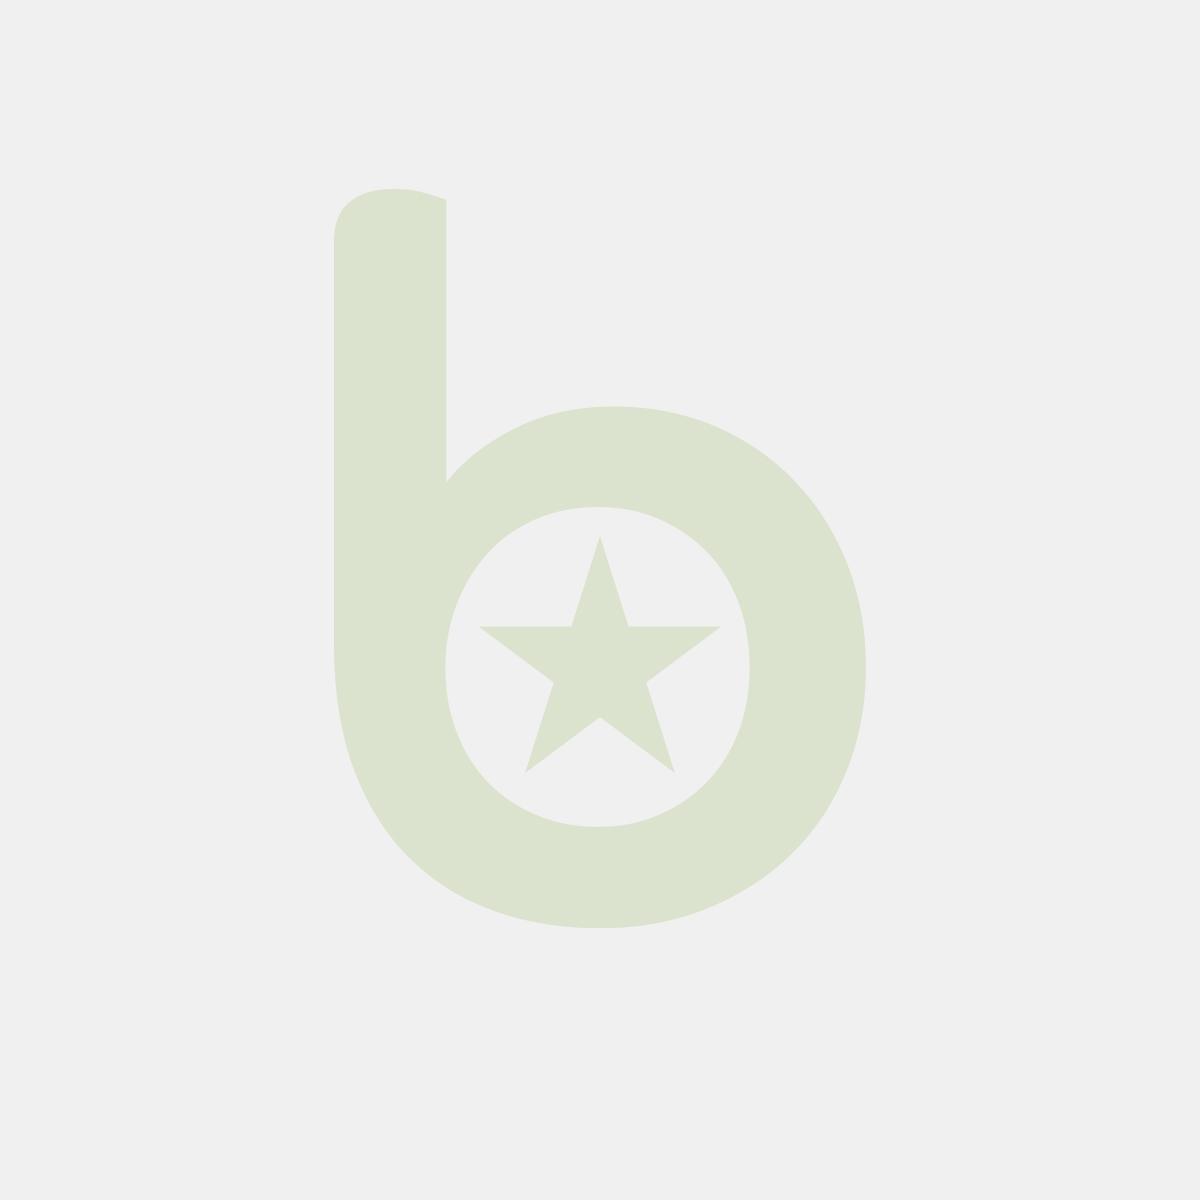 Tacka BURGER, FRYTKI brązowa 115x115x60 op. 100 sztuk